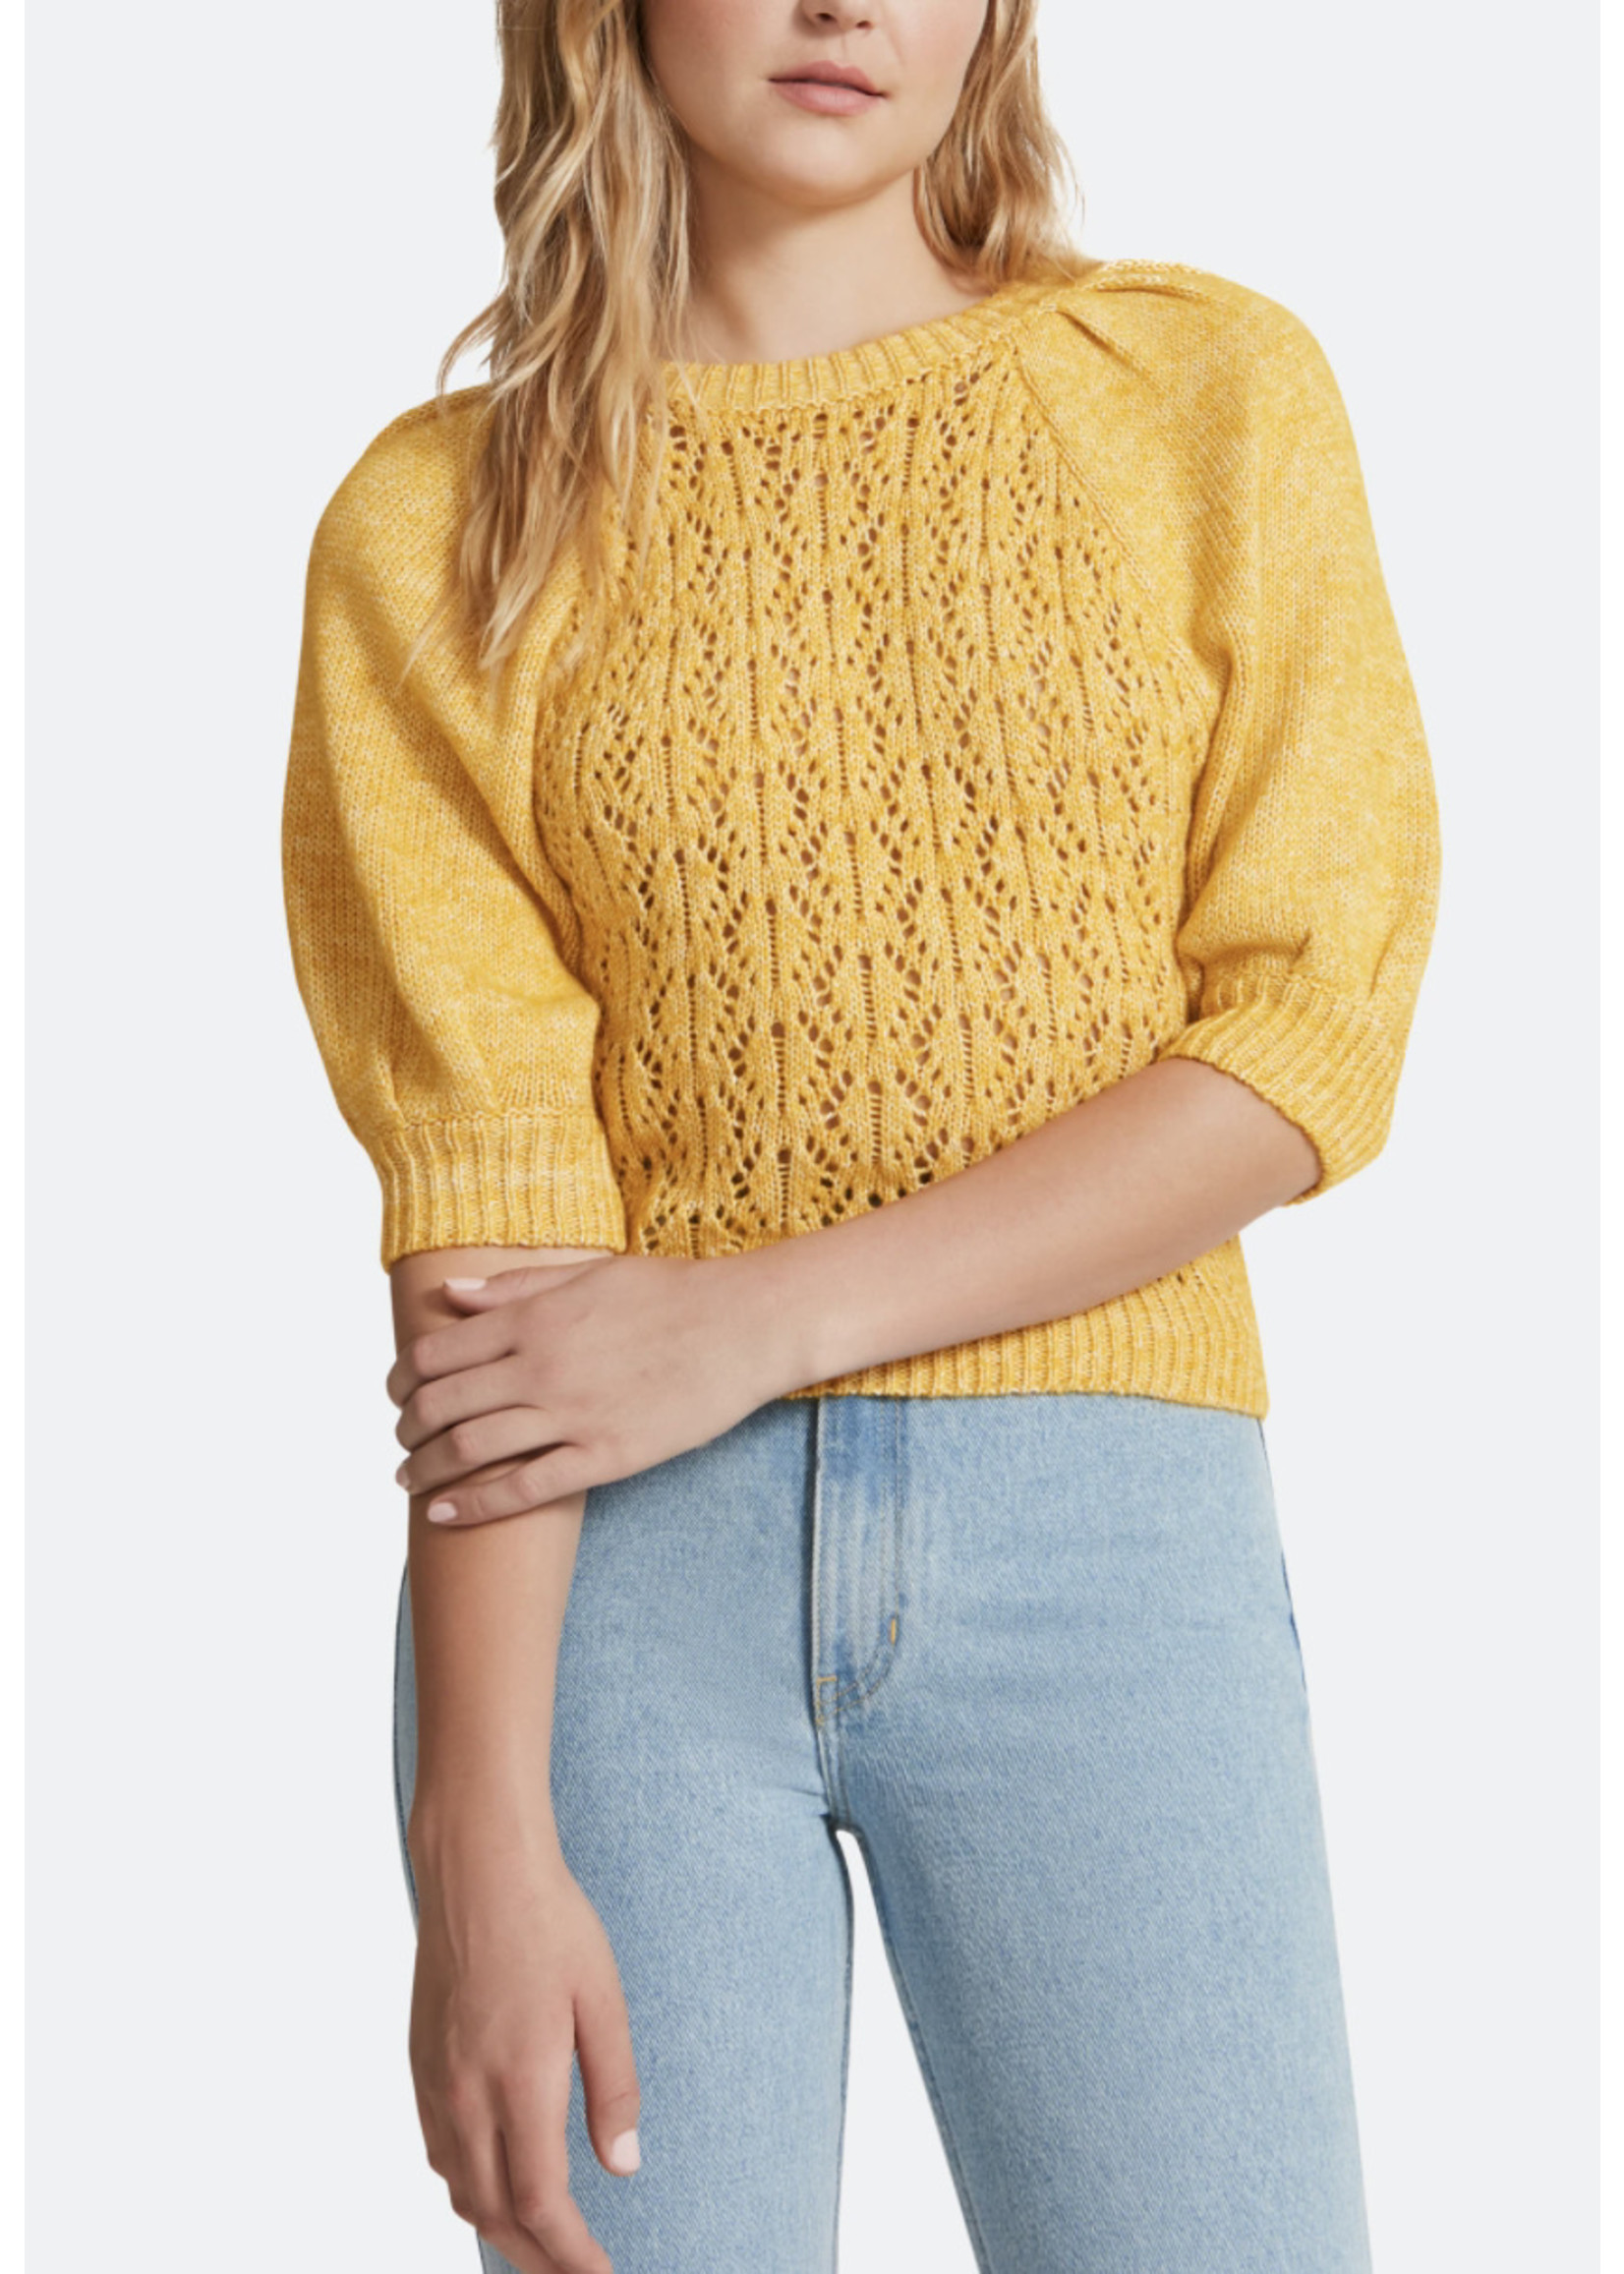 BB Dakota Come Here Soften Sweater - BL306015